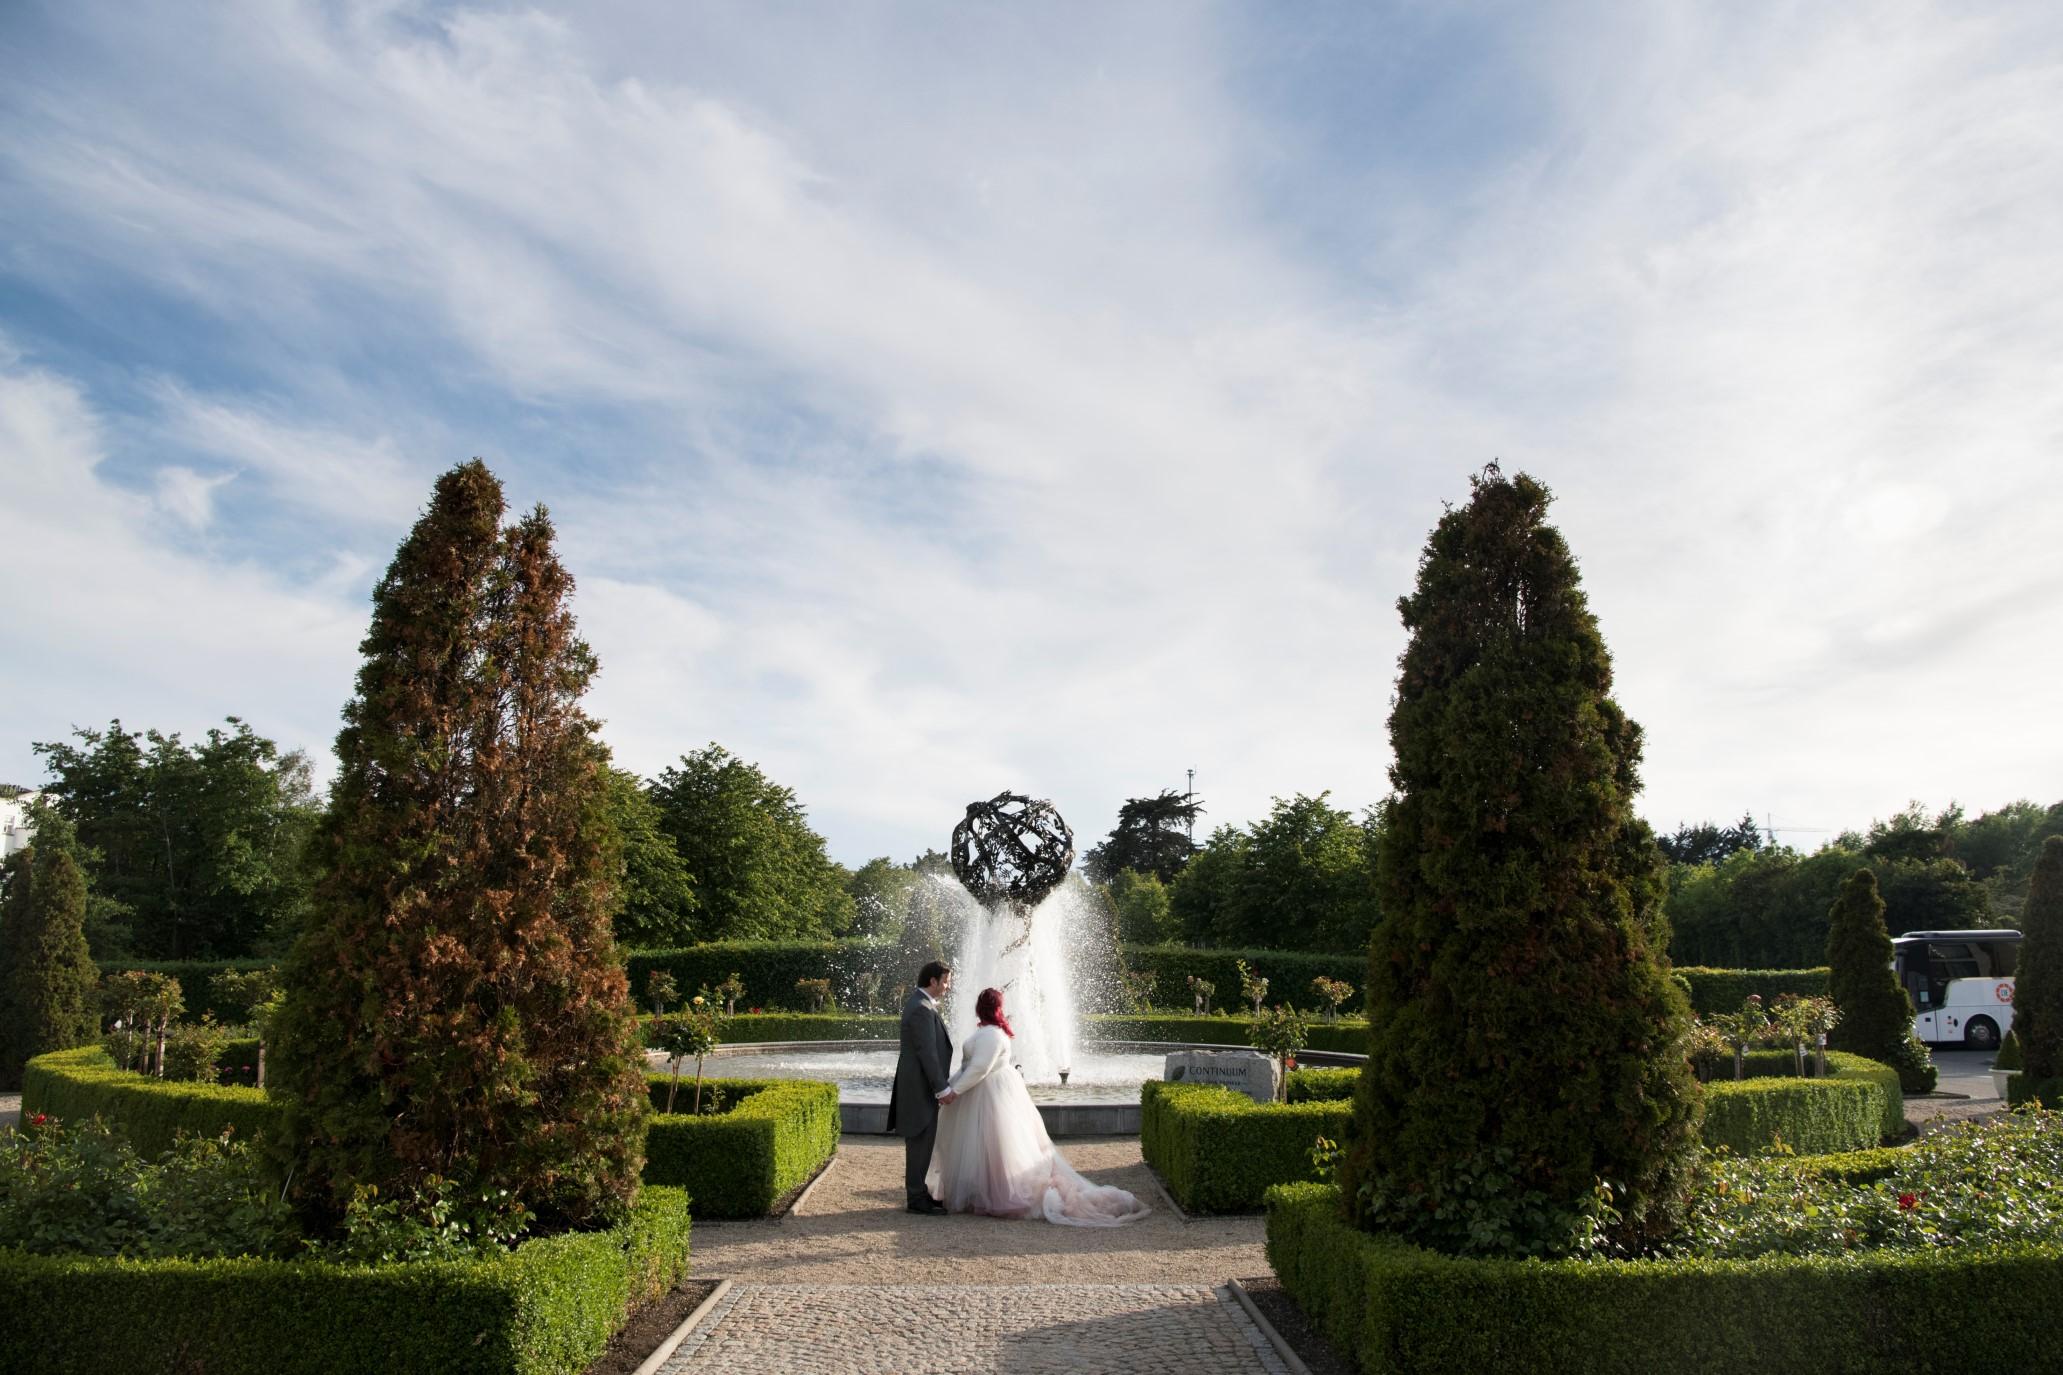 Zoo Wedding- Emma May Photography- Unconventional Wedding- Unique Wedding Inspiration 9